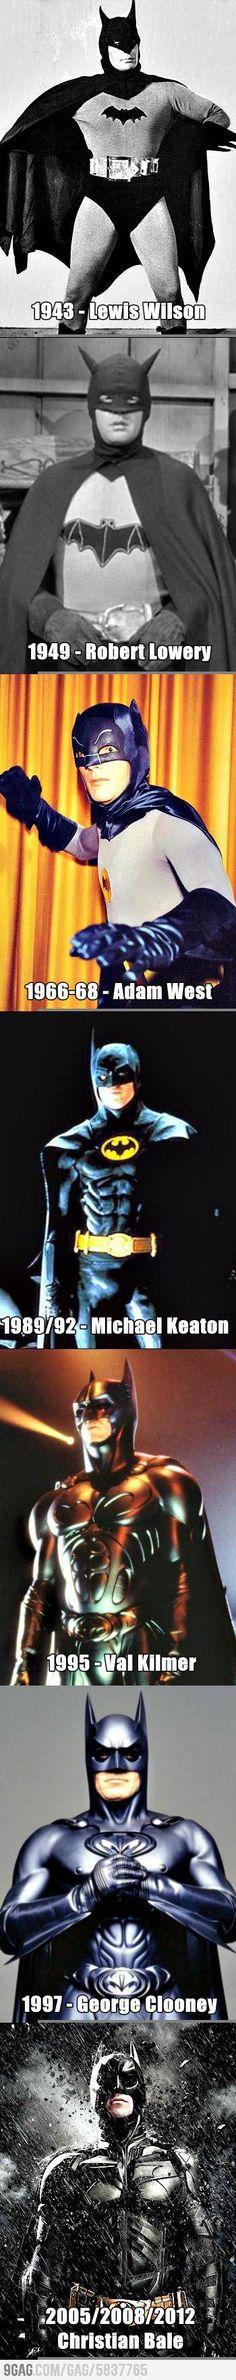 Evolution Of The Dark Knight